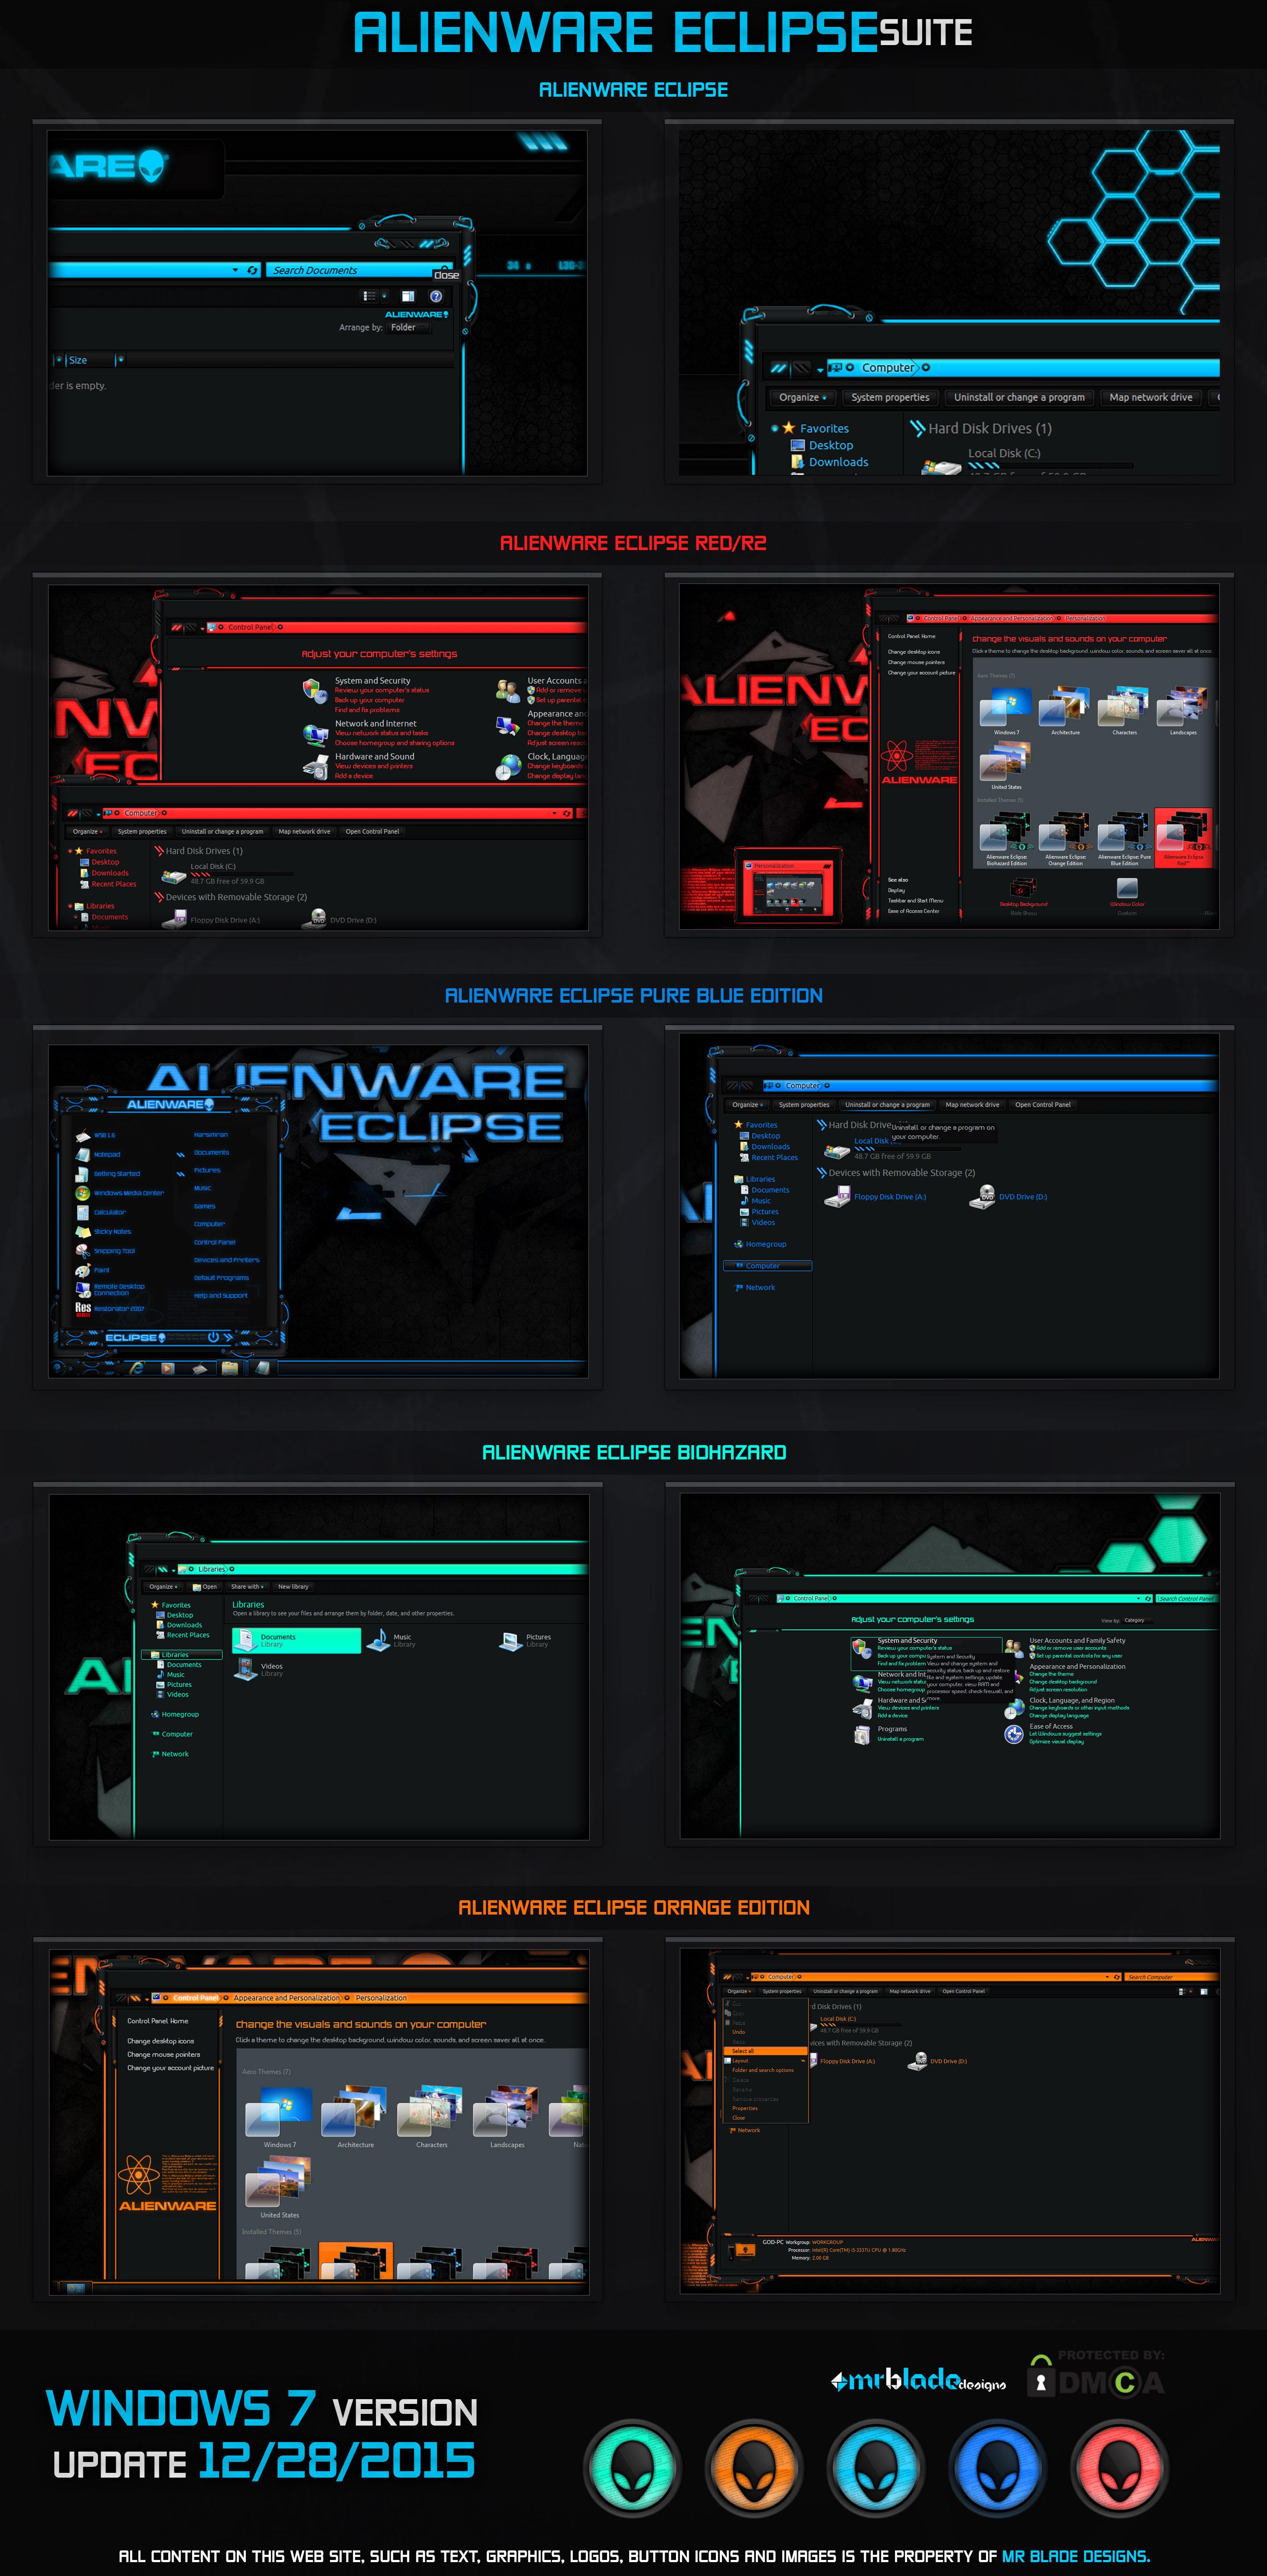 Alienware Eclipse Win7 by Mr-Blade